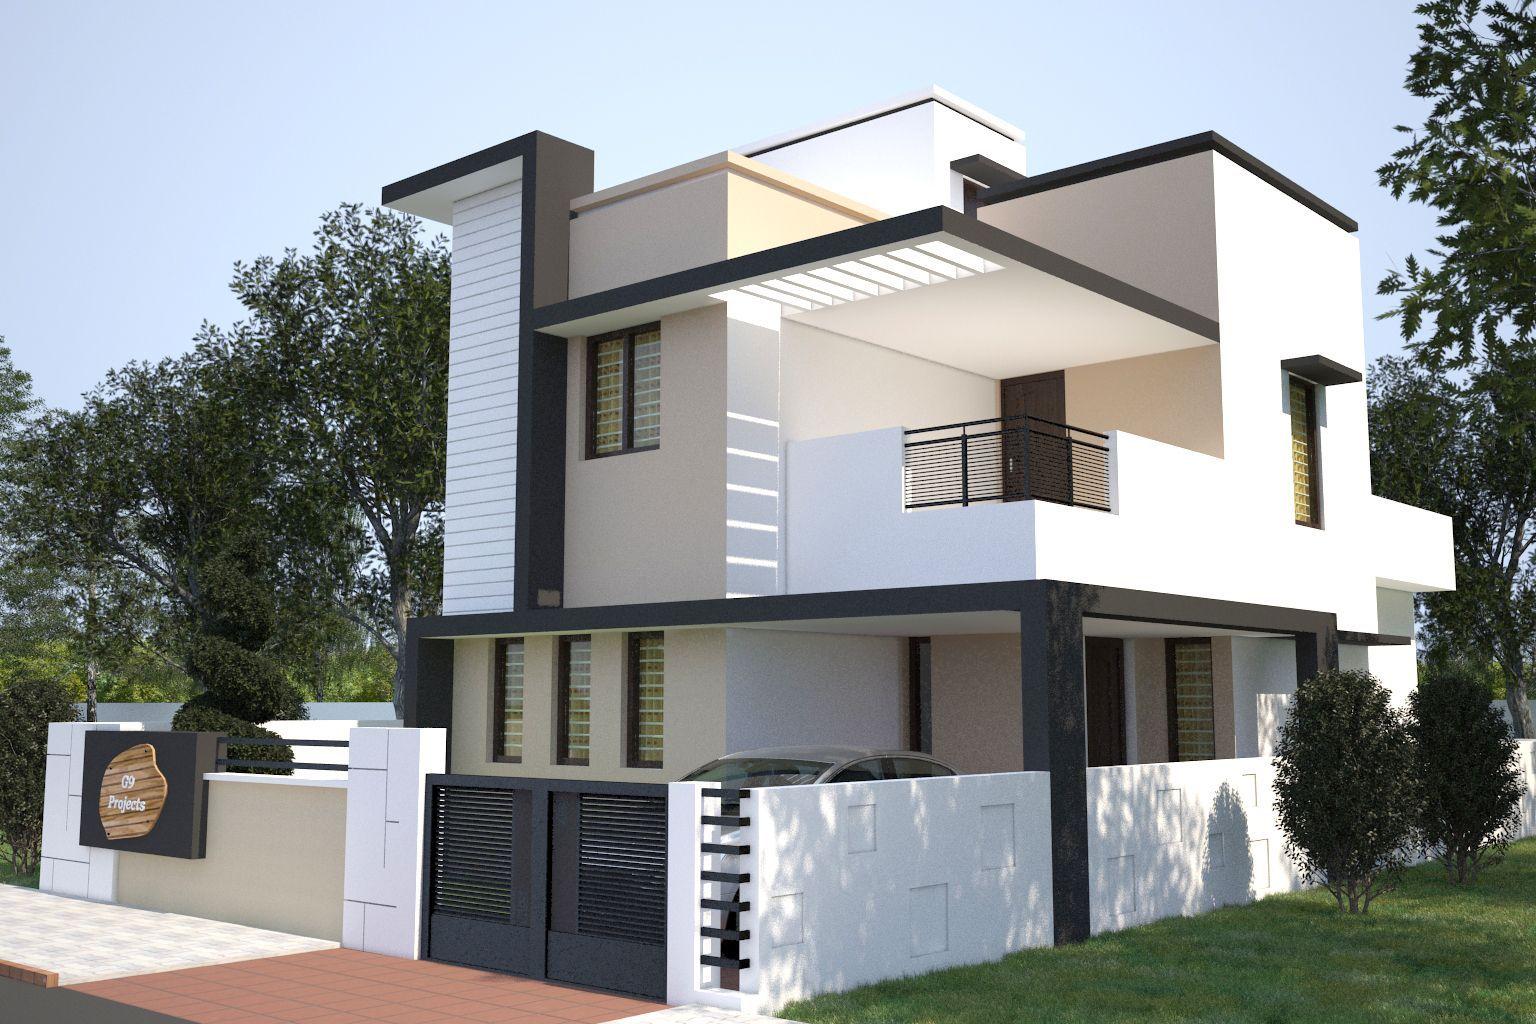 Etude house face designing contouring palette also hiqra di rh pinterest